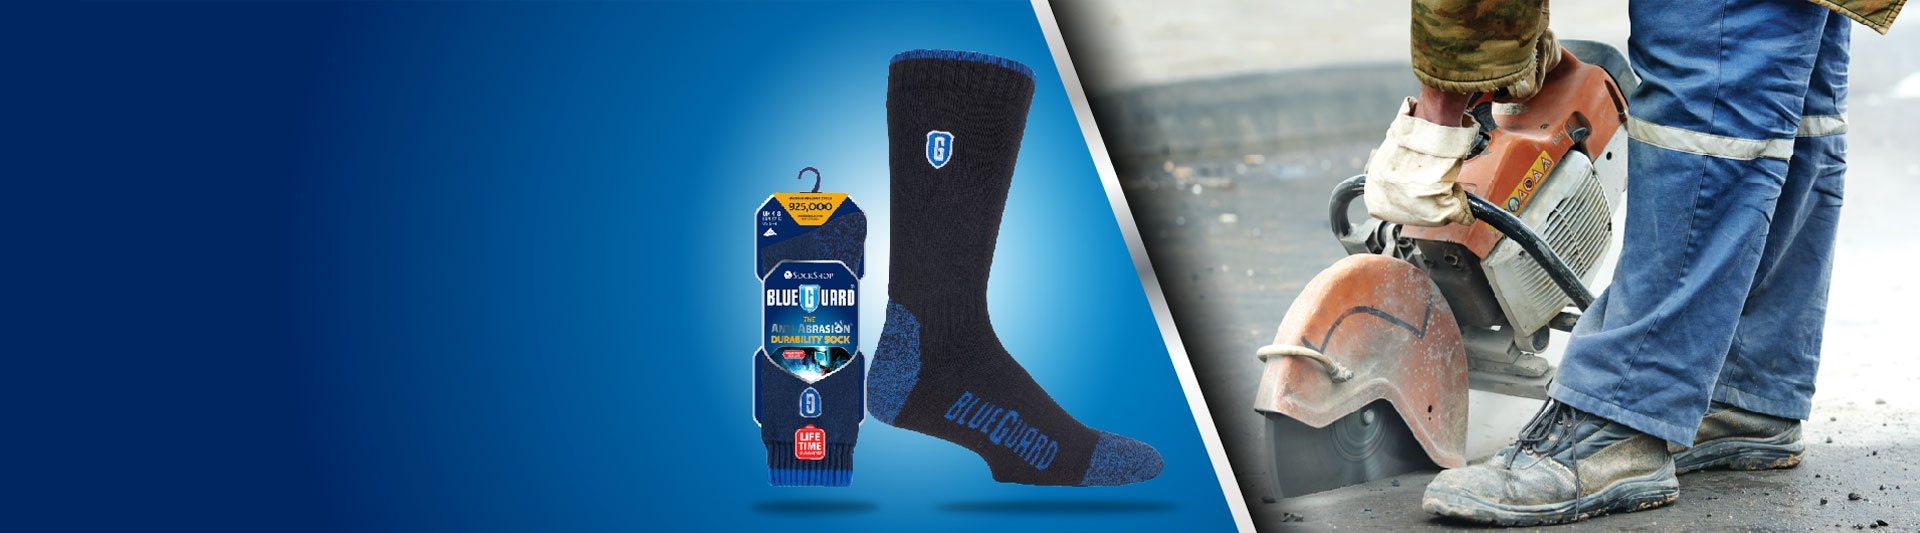 blue-guard Work Force Socks